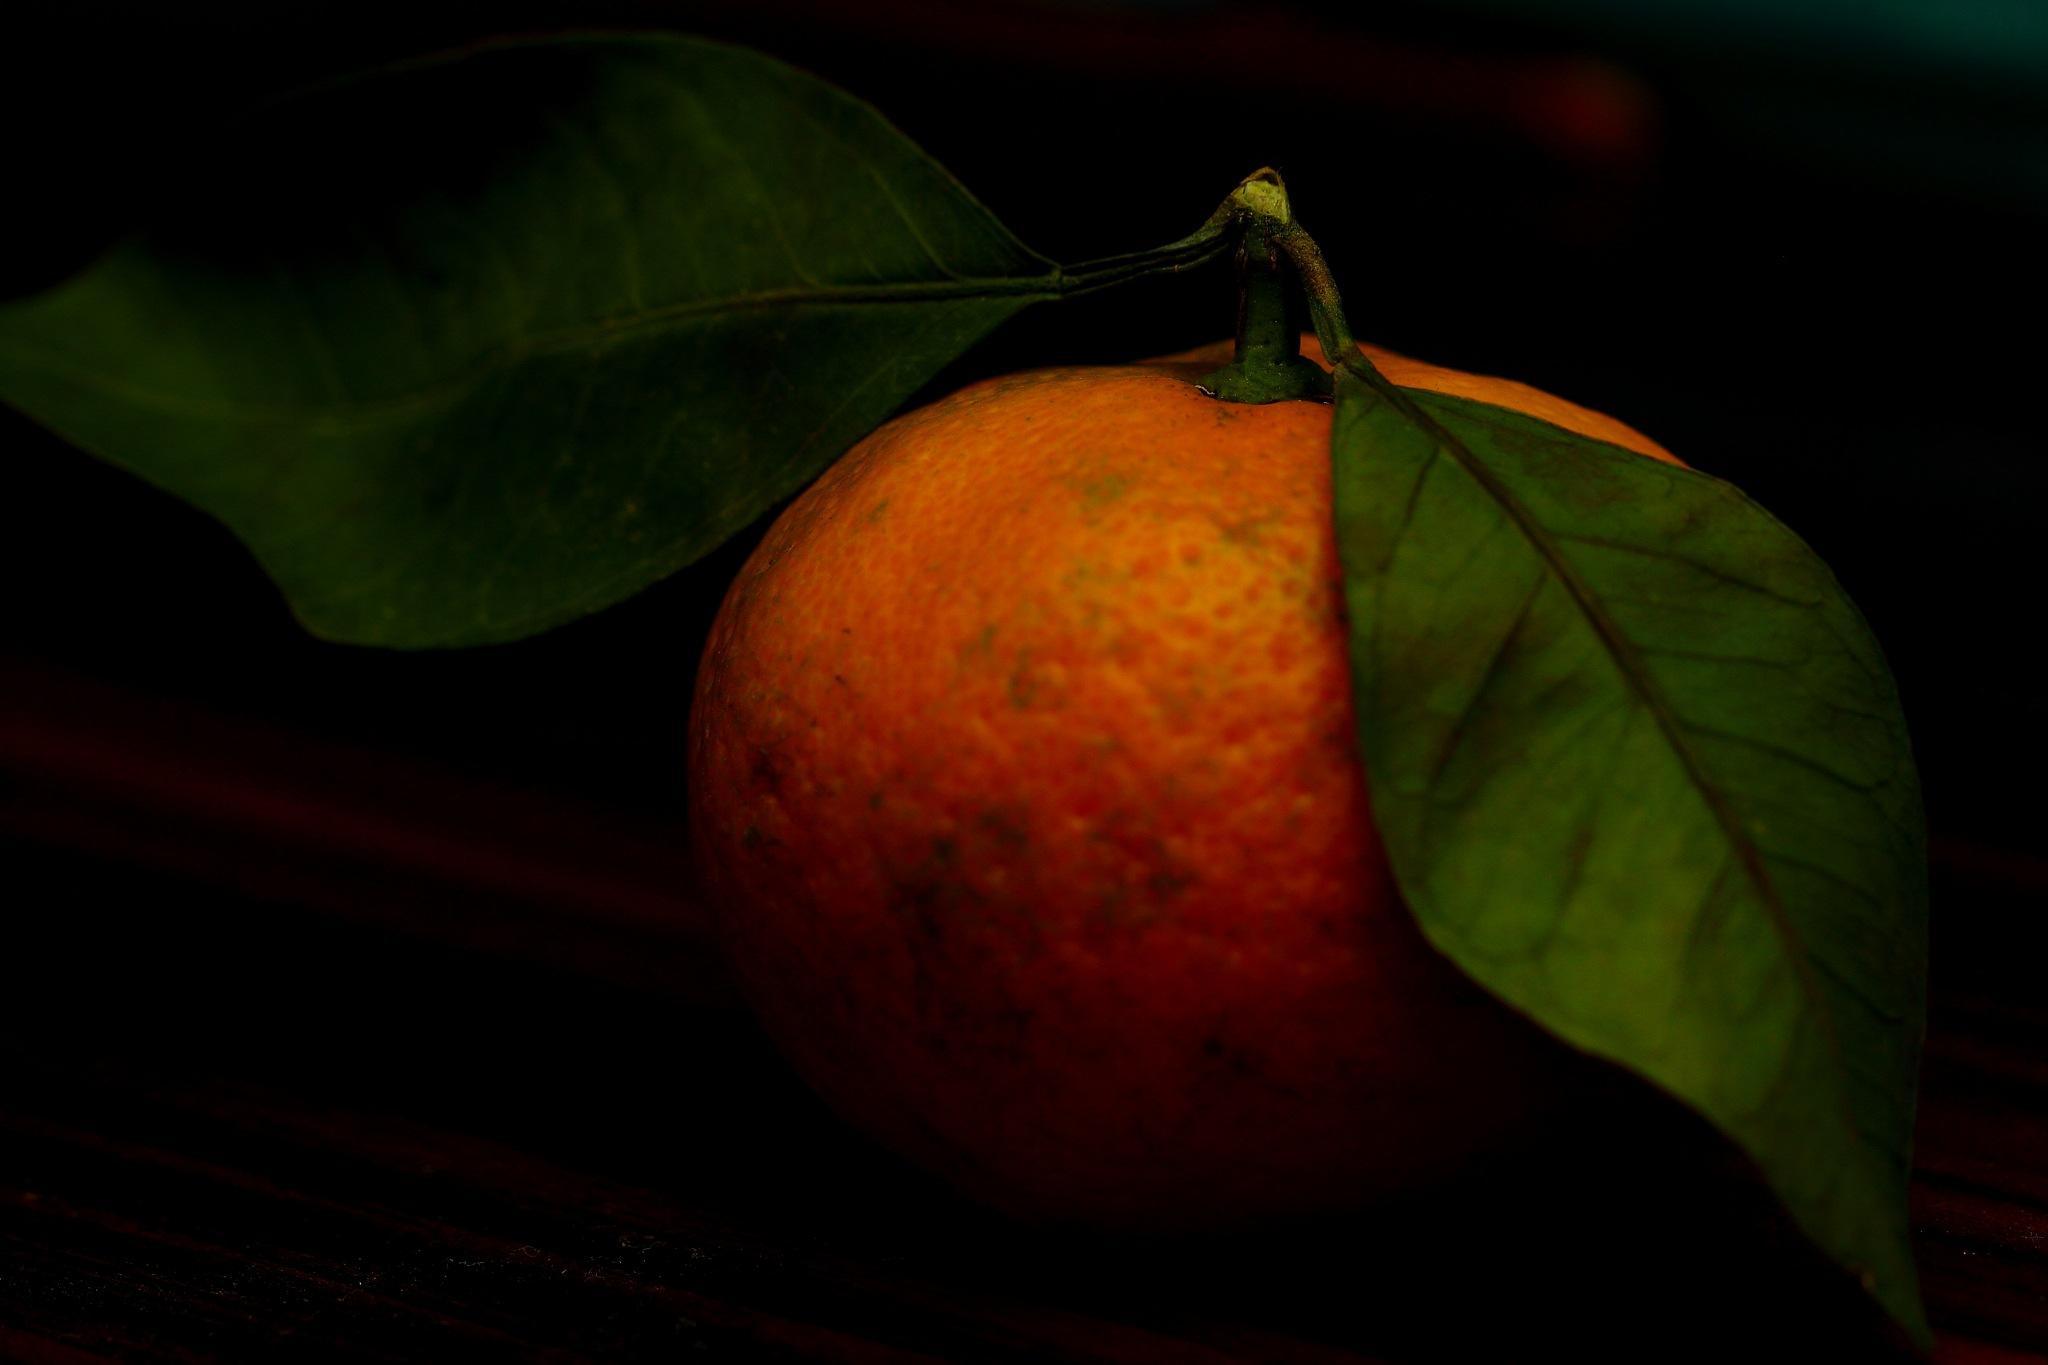 mandarin by Halil AKAY